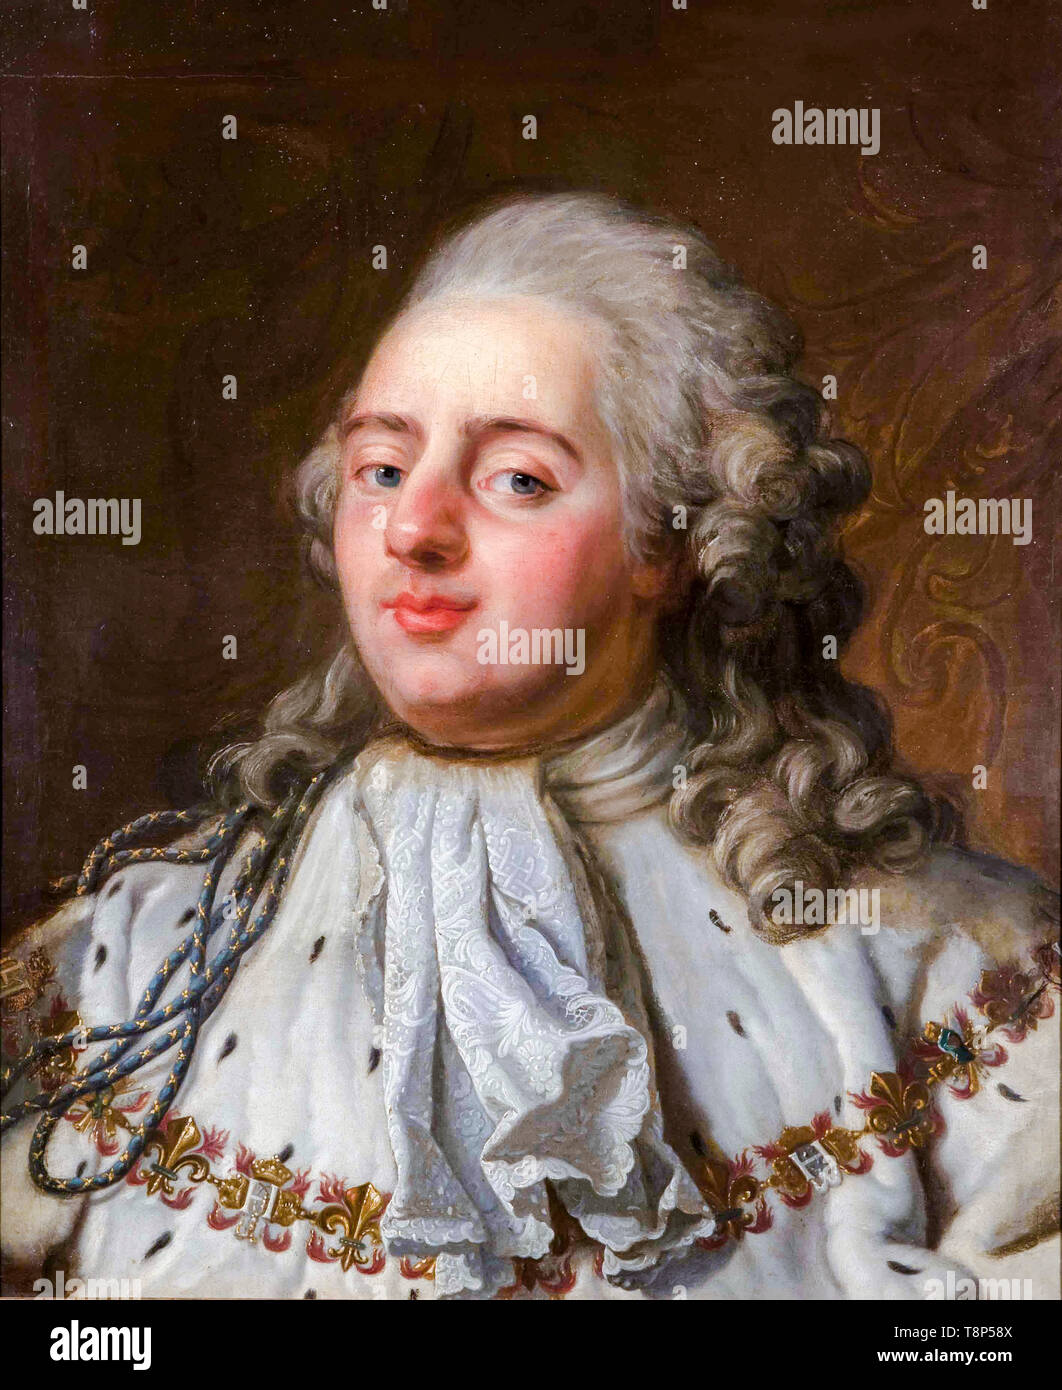 Antoine-François Callet, Portrait of Louis XVI of France, painting, 18th Century - Stock Image